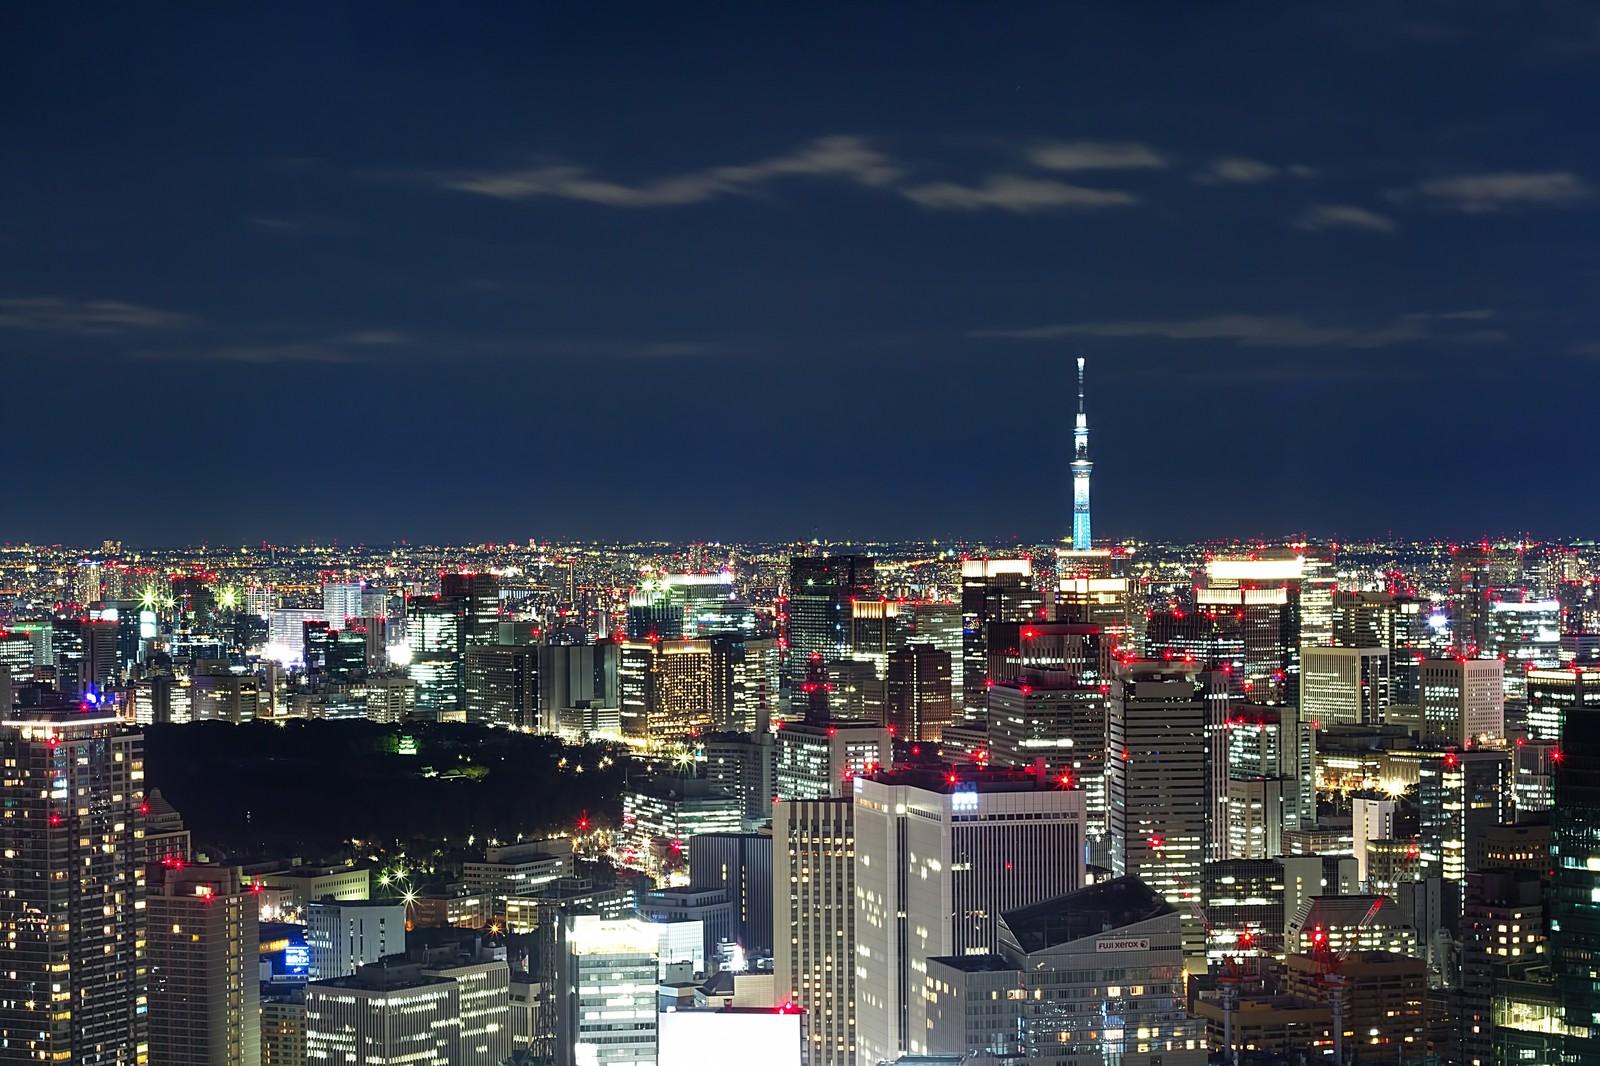 Ep0024[連載10]【あの日、灯火管制下の東京では星が見えた】週刊トレーダーズ・トリビューン